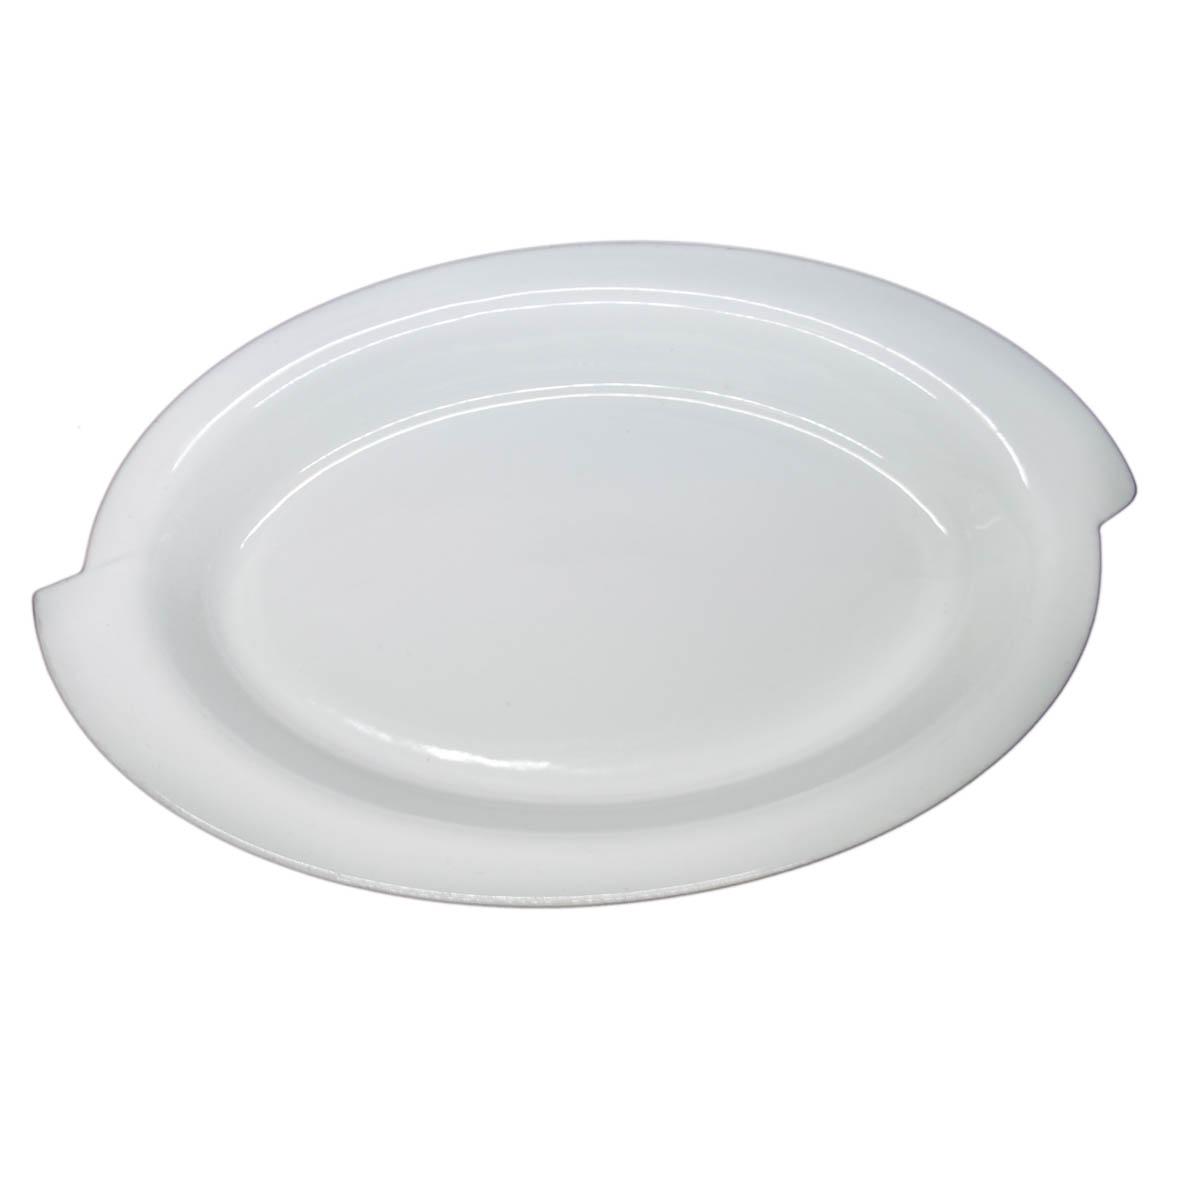 Travessa de Porcelana Oval Borda S 59x32,5x7